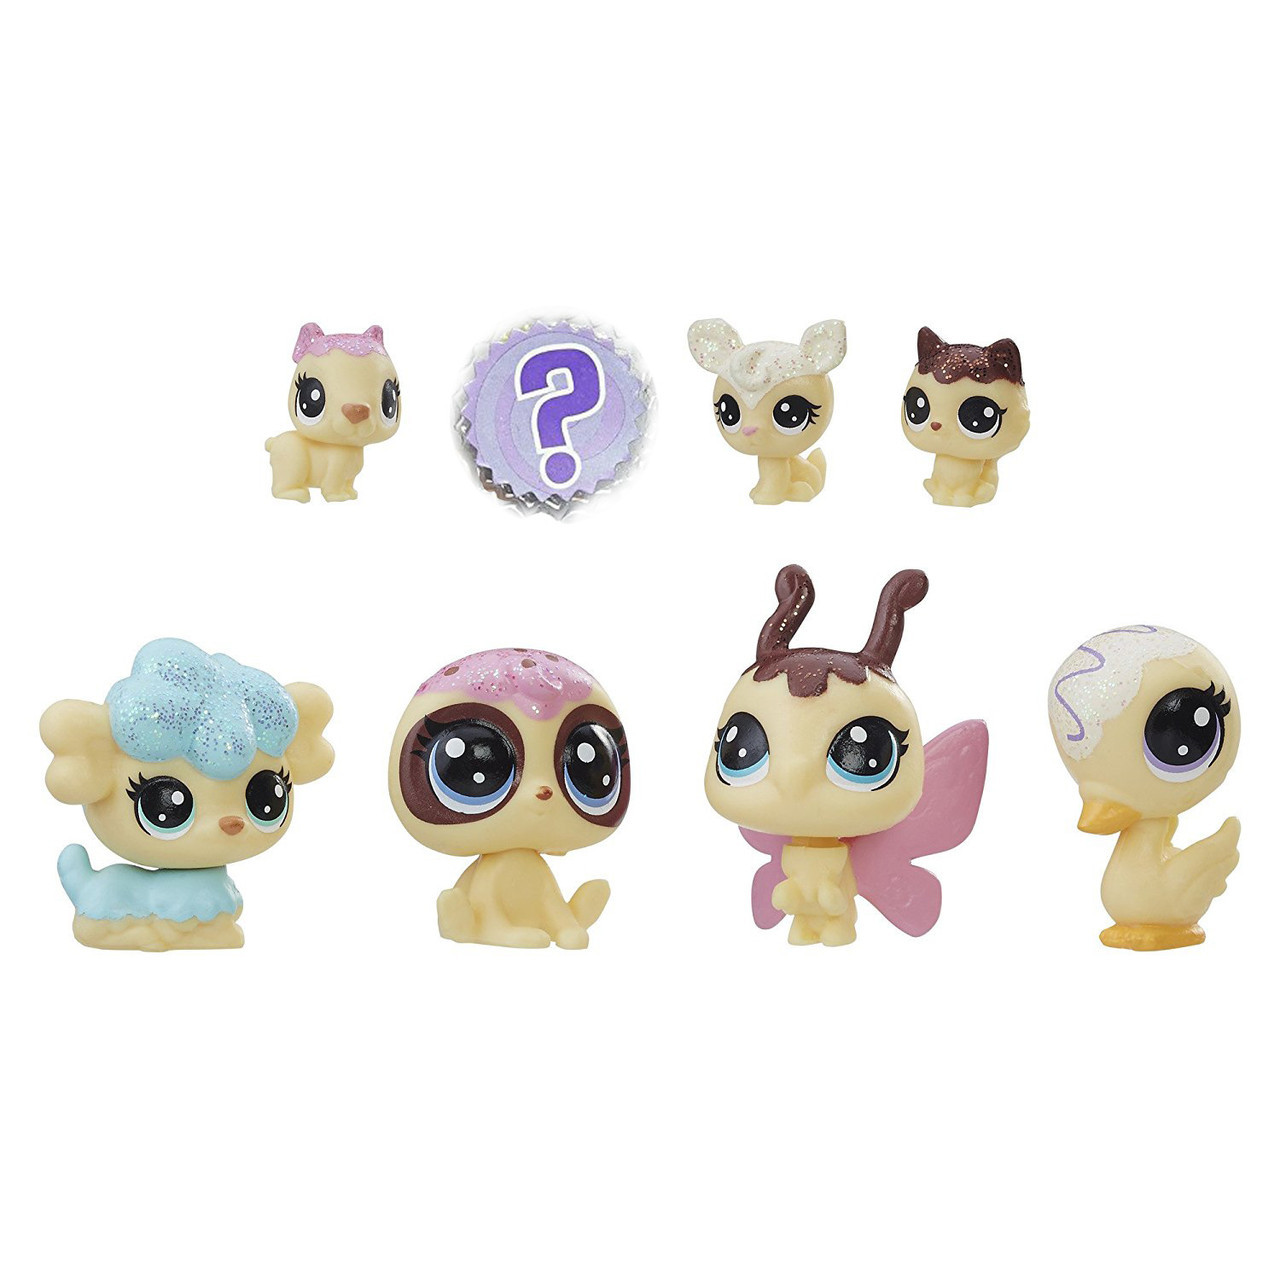 Лител пет шоп набор из 8 ми зверюшек серия 2 Друзья Littlest Pet Shop Black & White Pet Friends